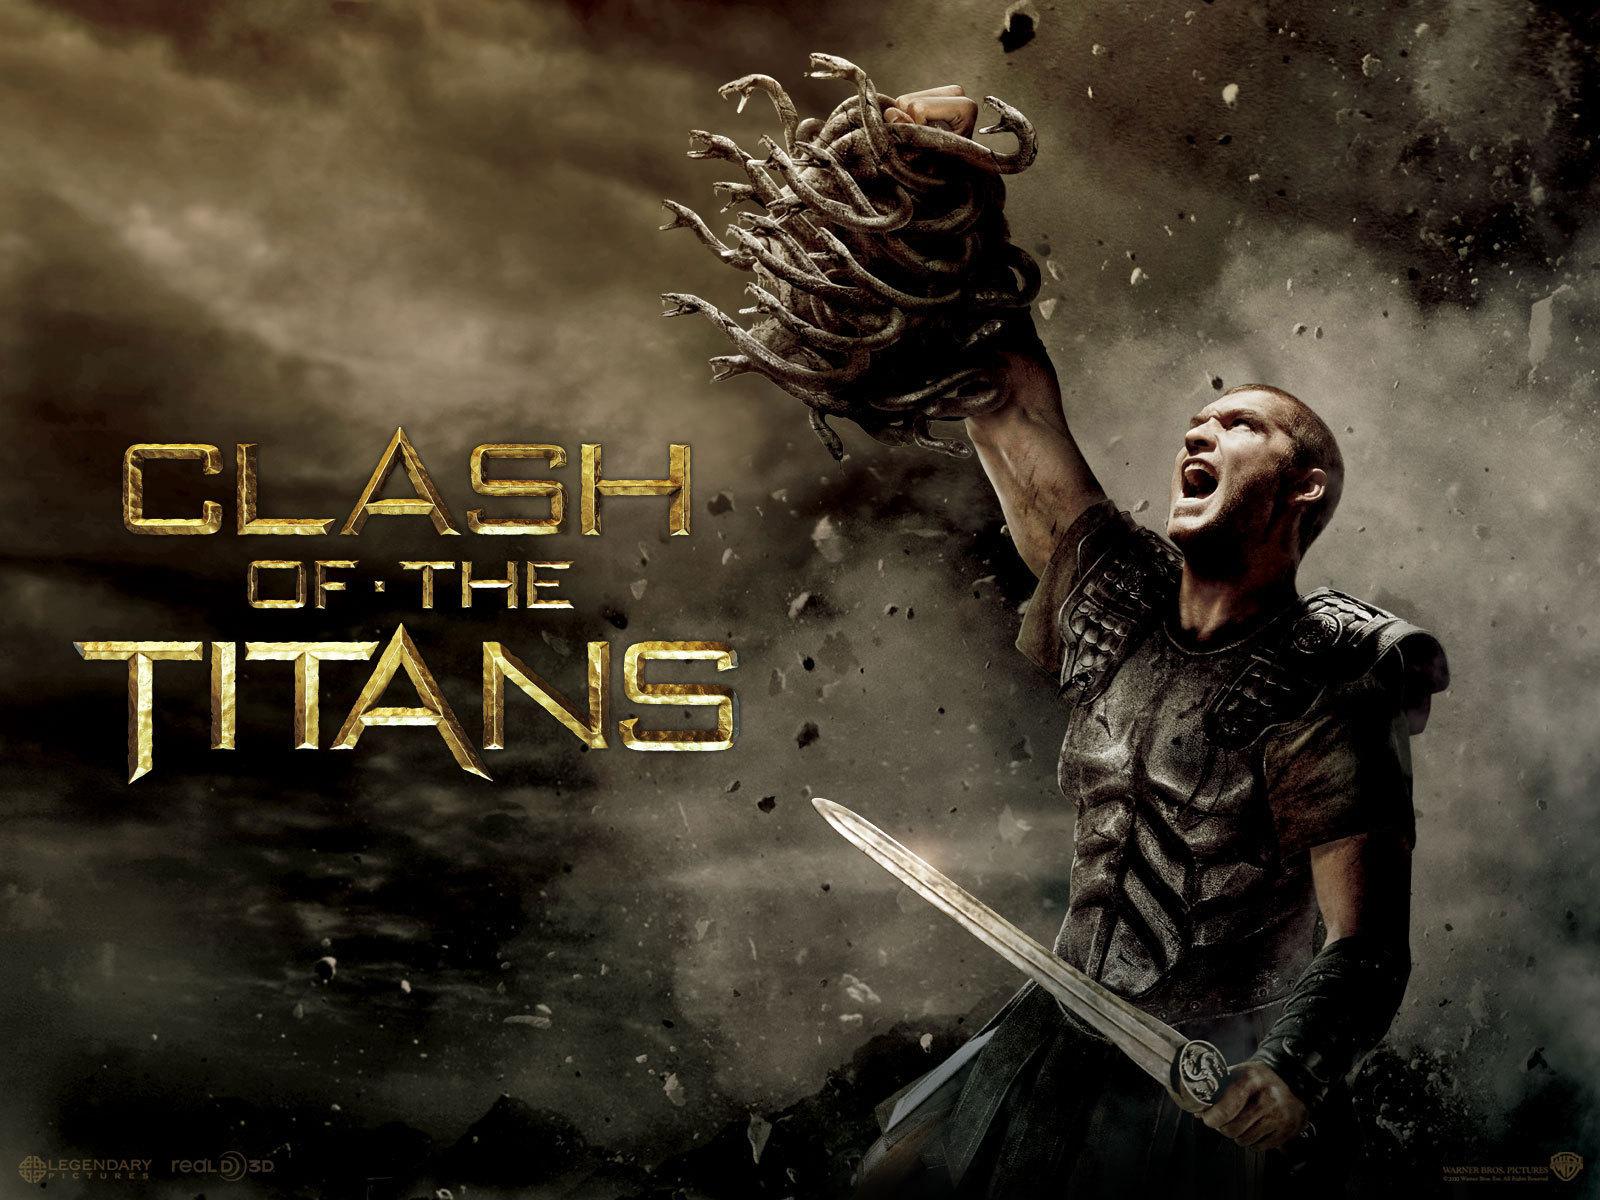 Sam in Clash of The Titans 壁纸